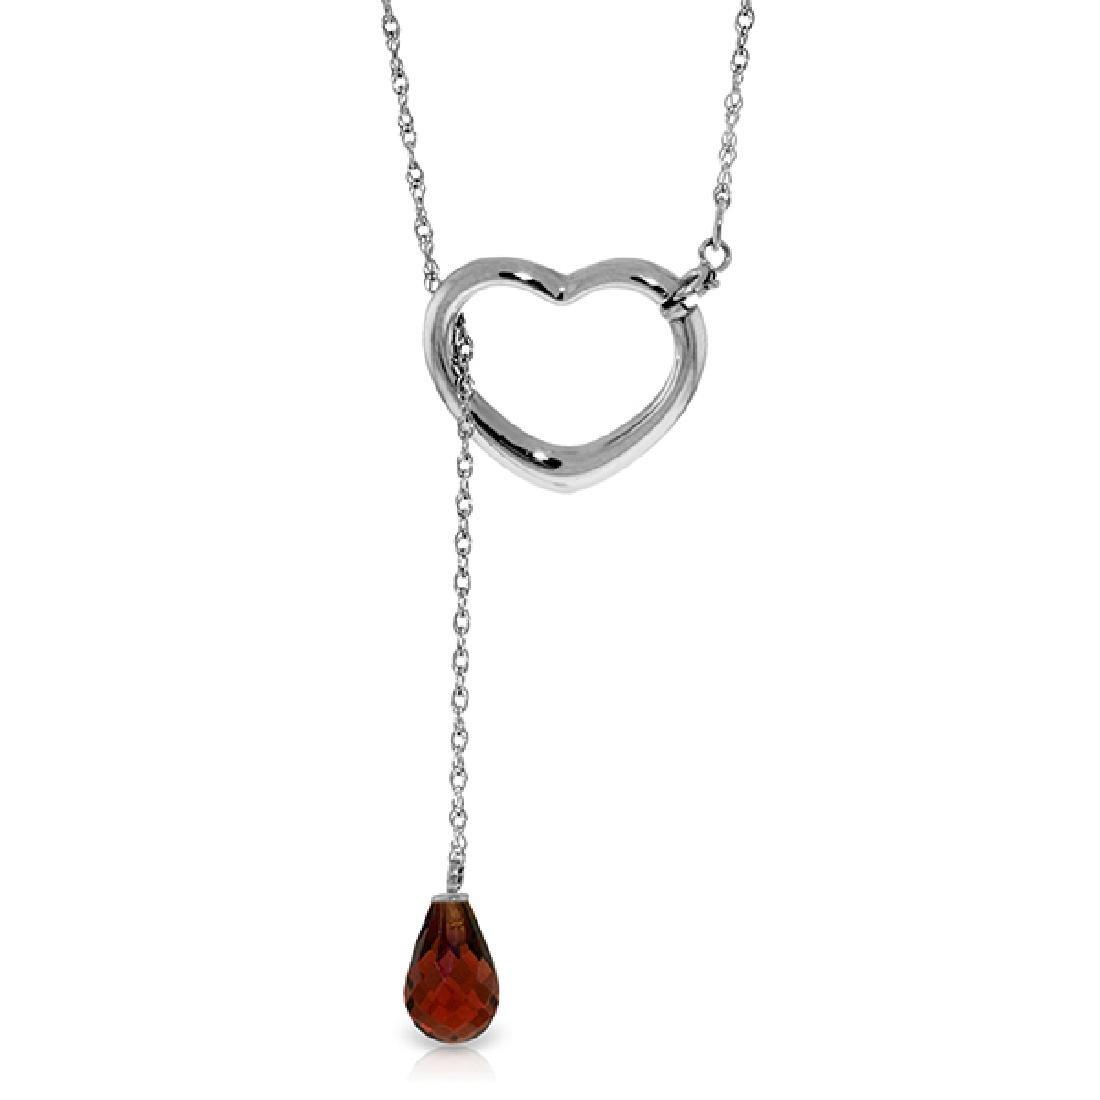 Genuine 2.25 ctw Garnet Necklace Jewelry 14KT White